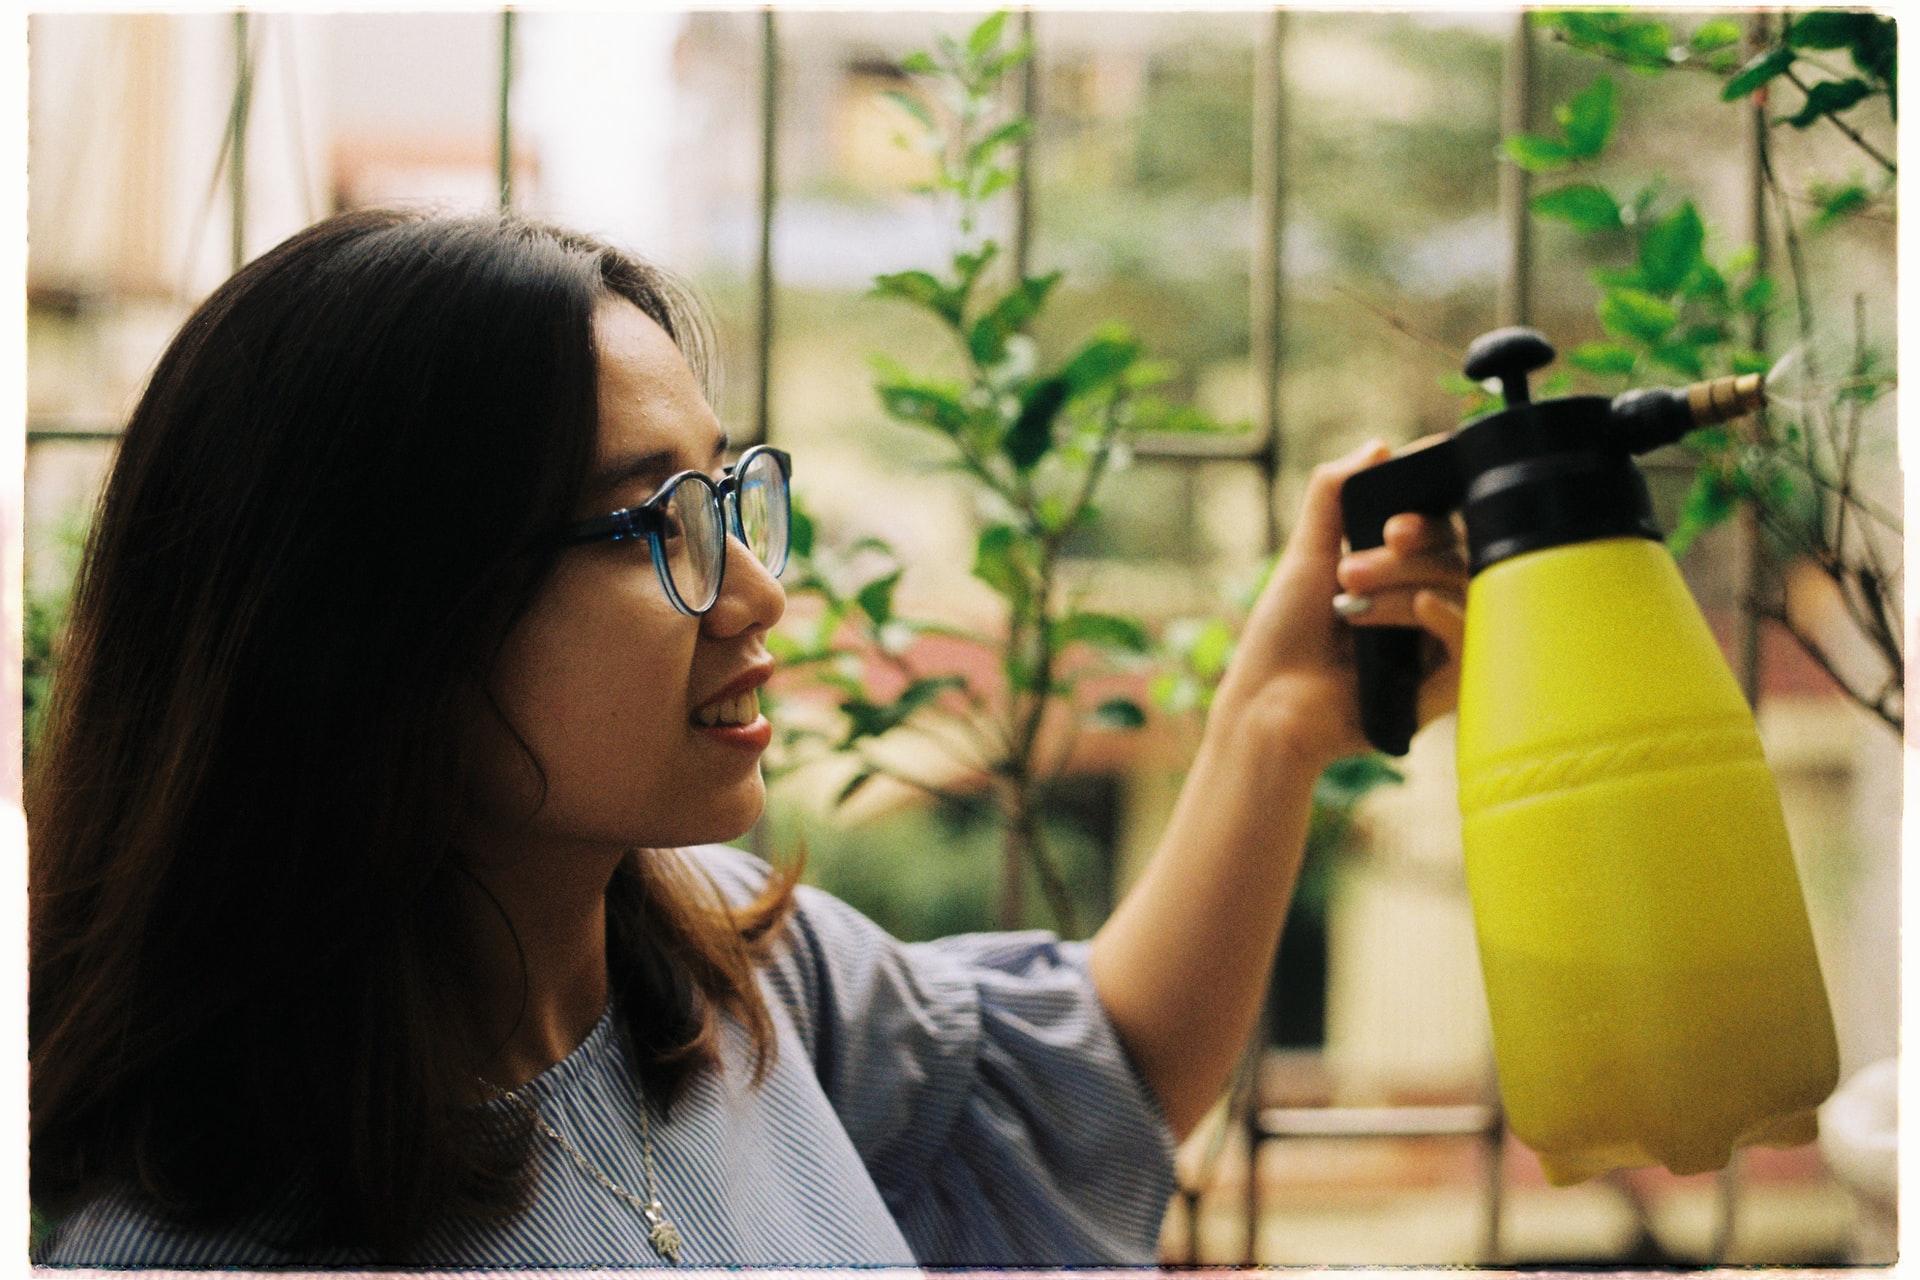 woman holding water sprayer